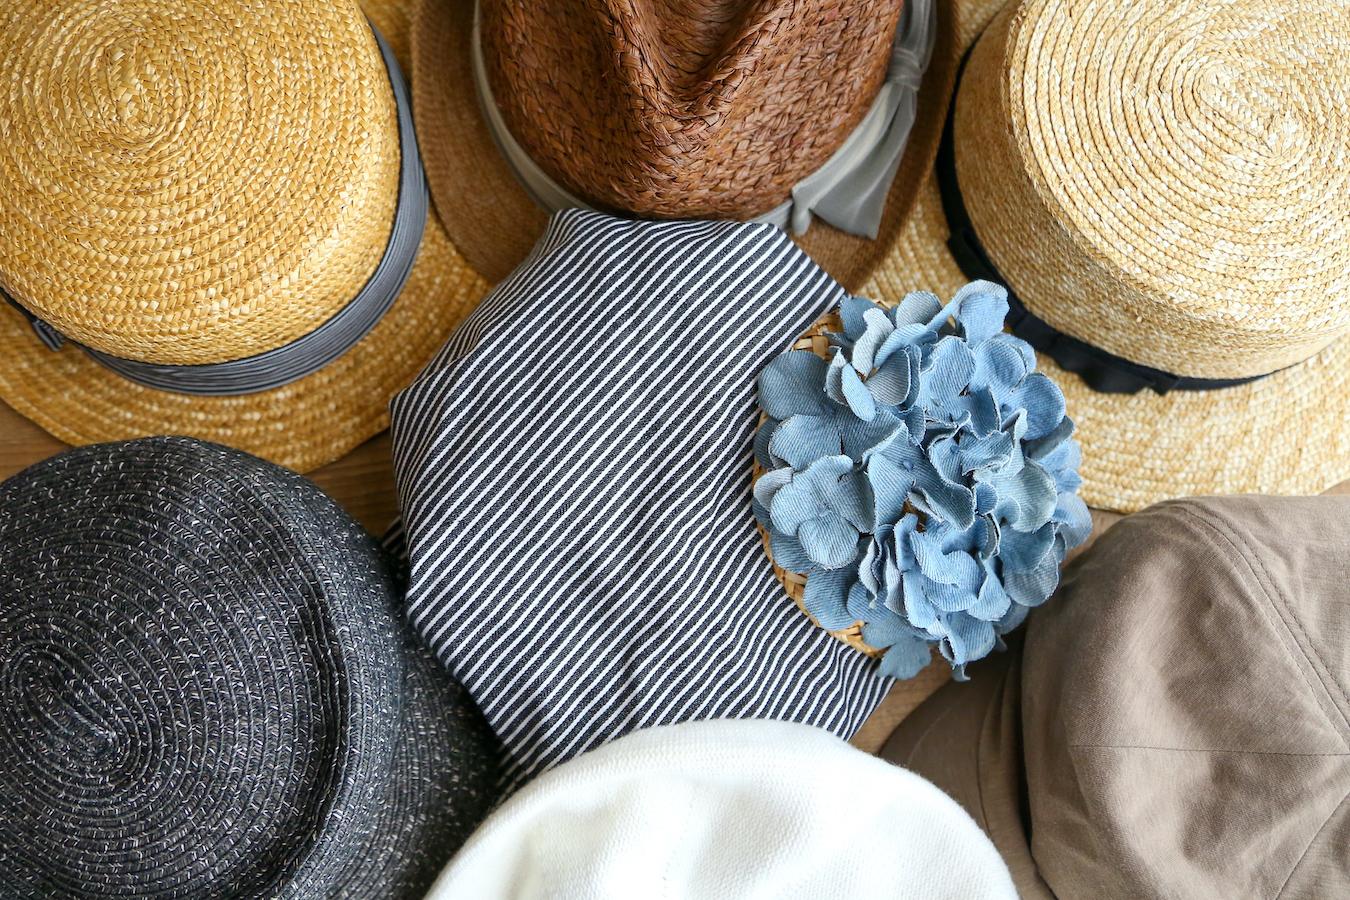 KaEriさんの春夏用のお気に入り帽子コレクション